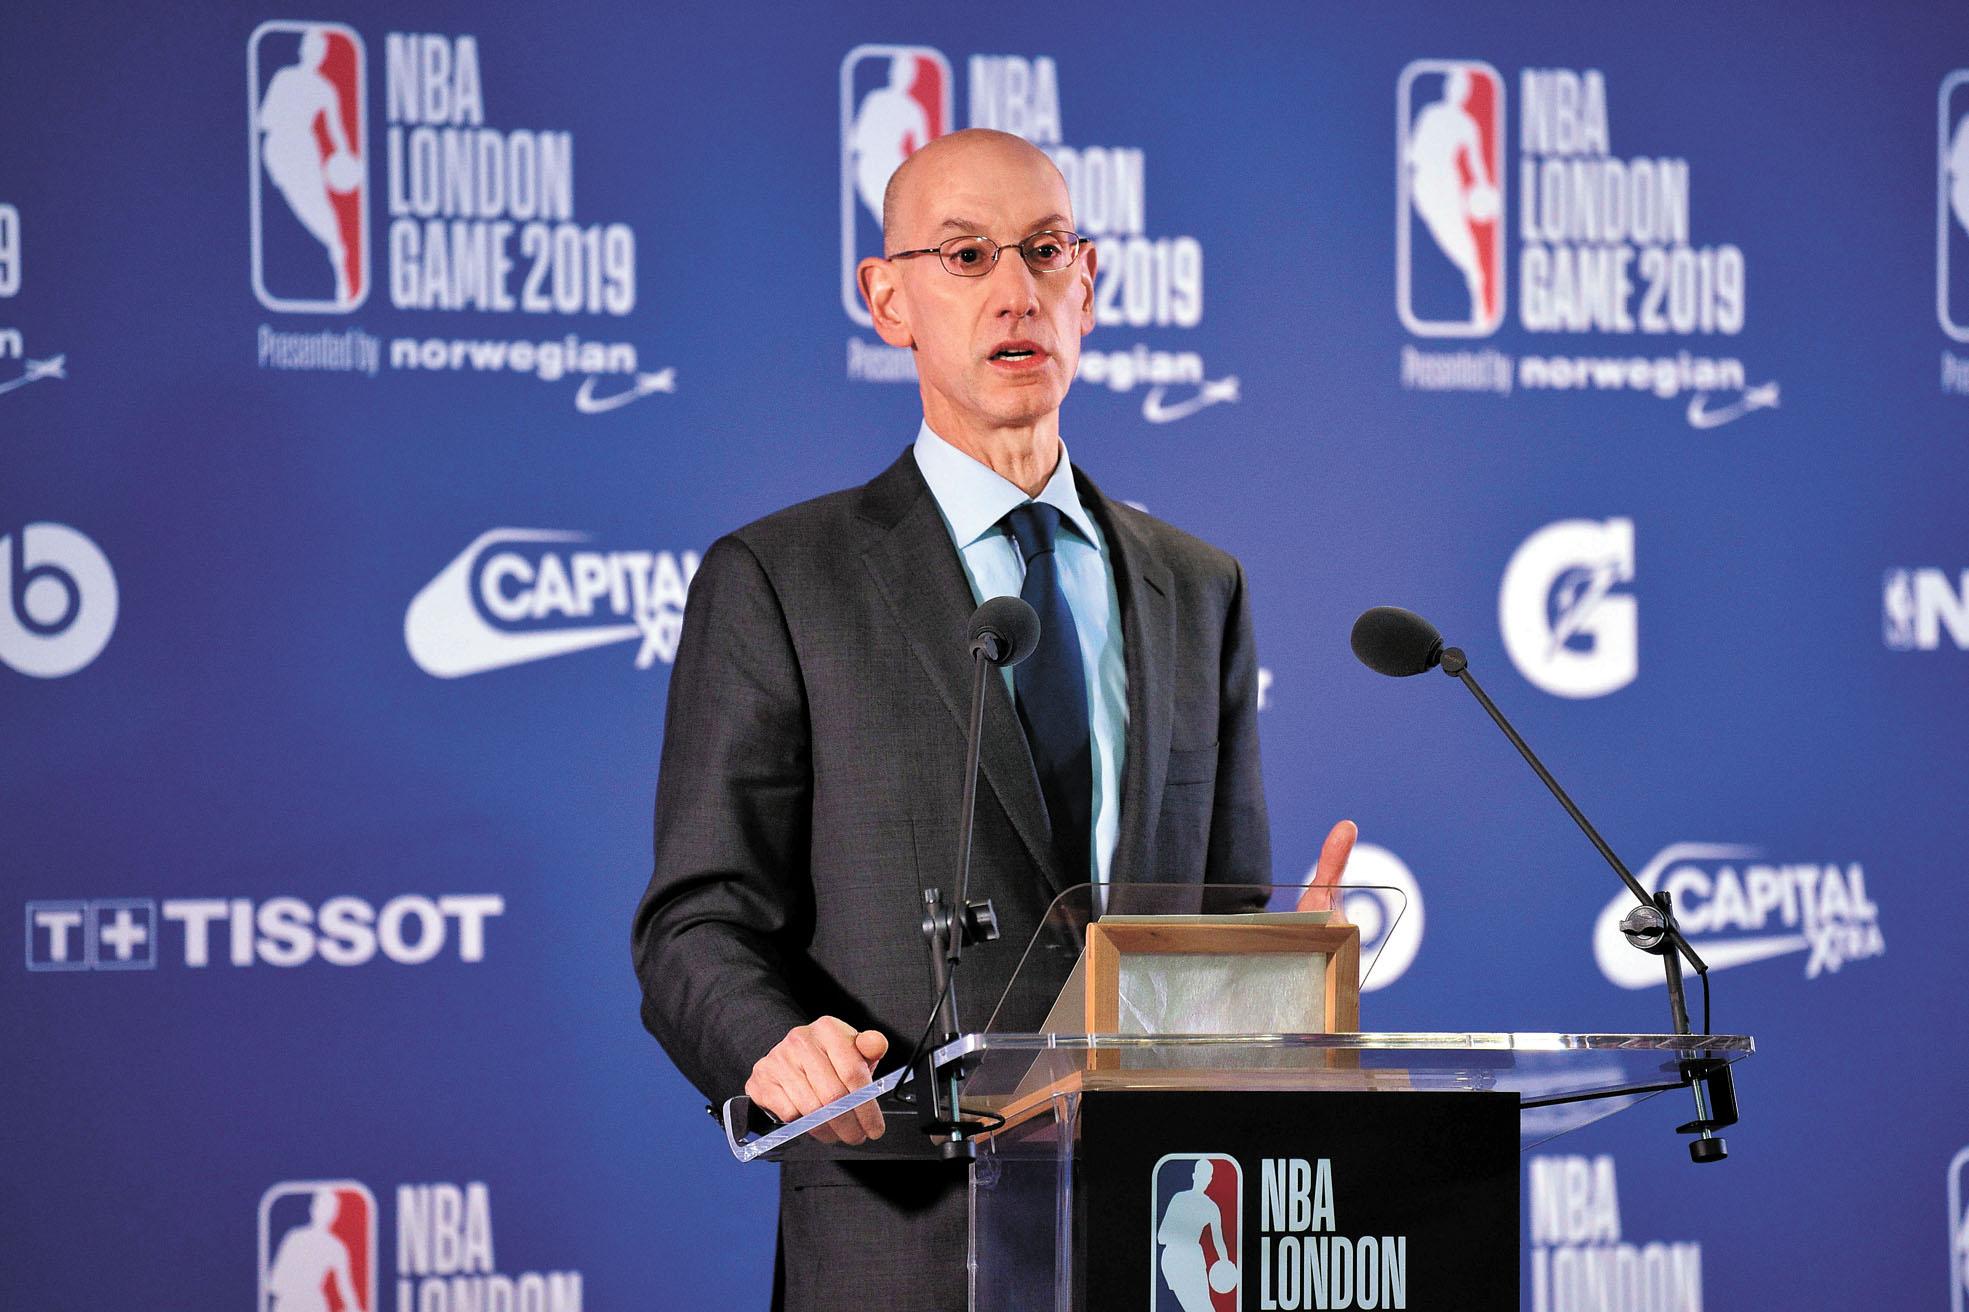 NBA總裁蕭華7日表示,自己已經知悉這一事件對聯盟造成的損害,但選擇支持莫雷言論自由的權利。法新社